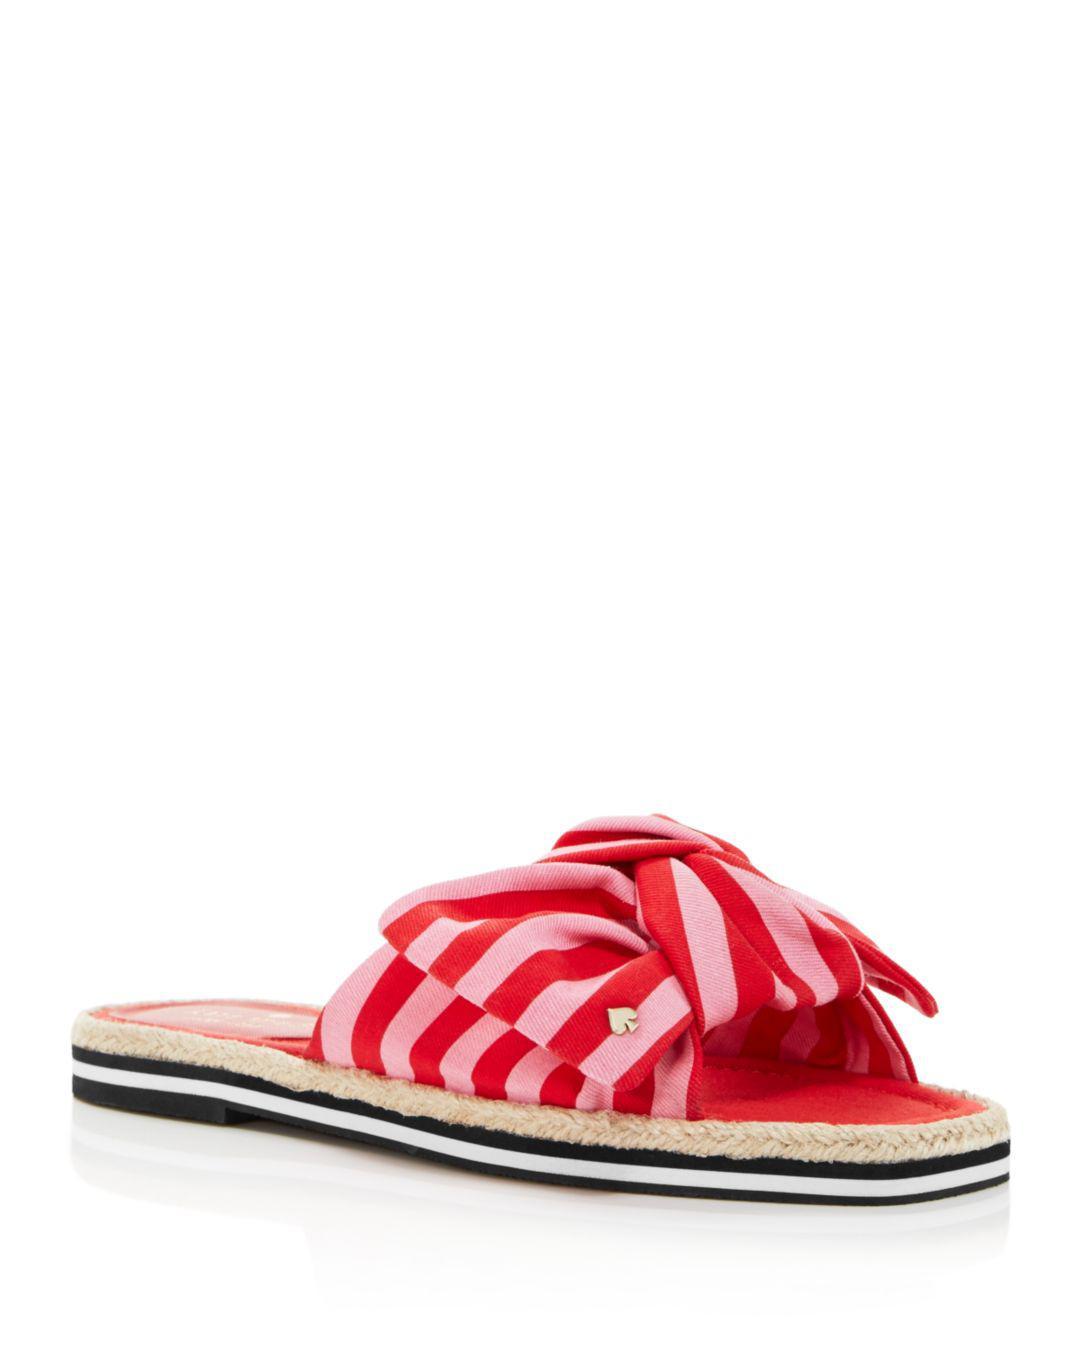 b52e33b5614c Kate Spade Caliana Flat Sandals in Red - Save 26% - Lyst